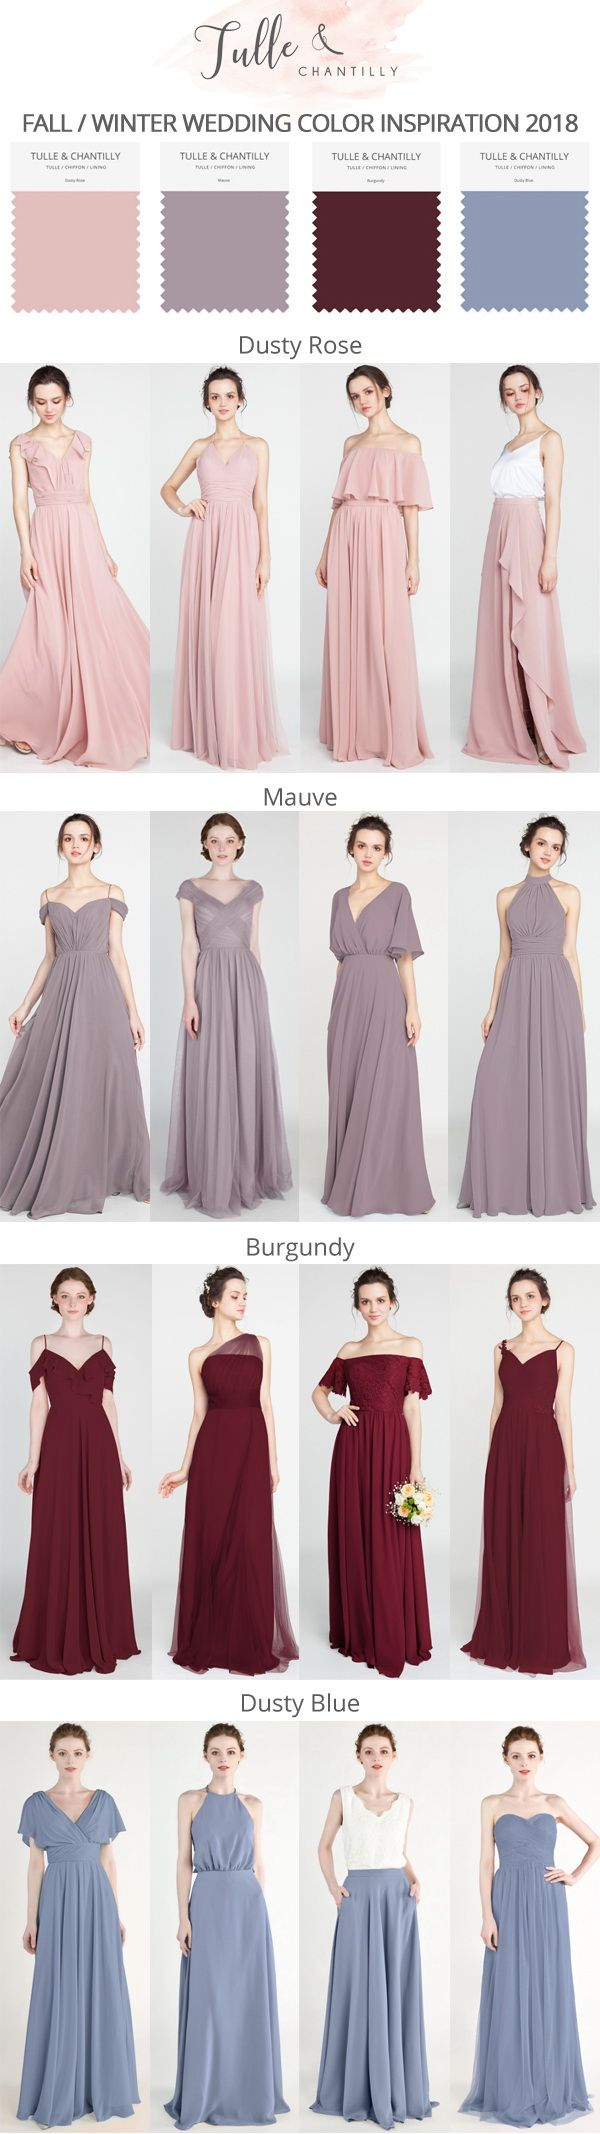 Casual wedding dresses for winter wedding  fall winter wedding color ideas and bridesmaid dresses  wedding